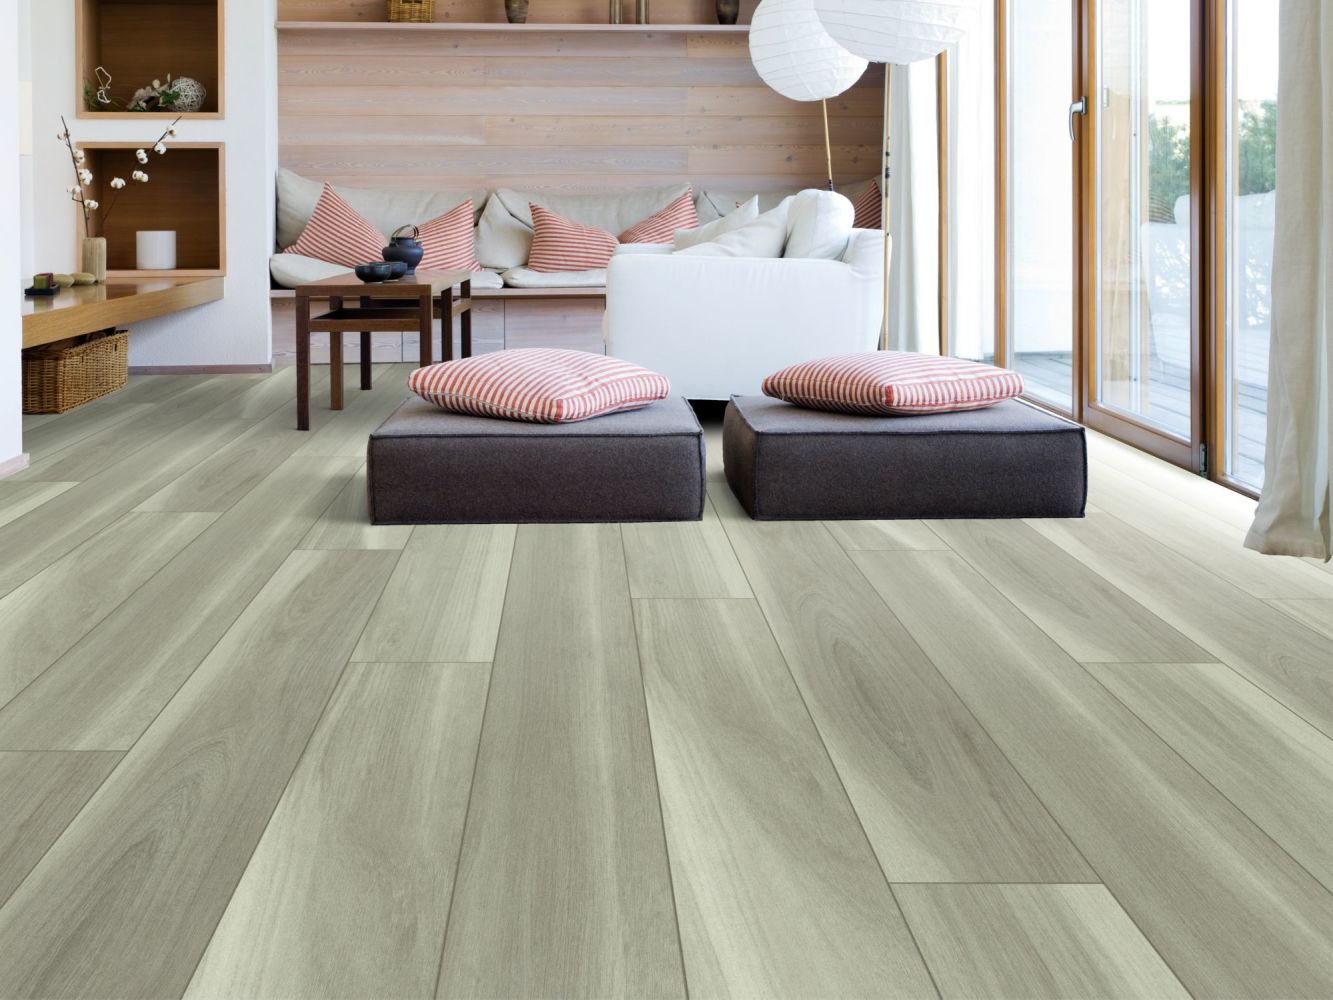 Shaw Floors Resilient Property Solutions Barrel Oak 720c Plus Misty Oak 05008_515RG